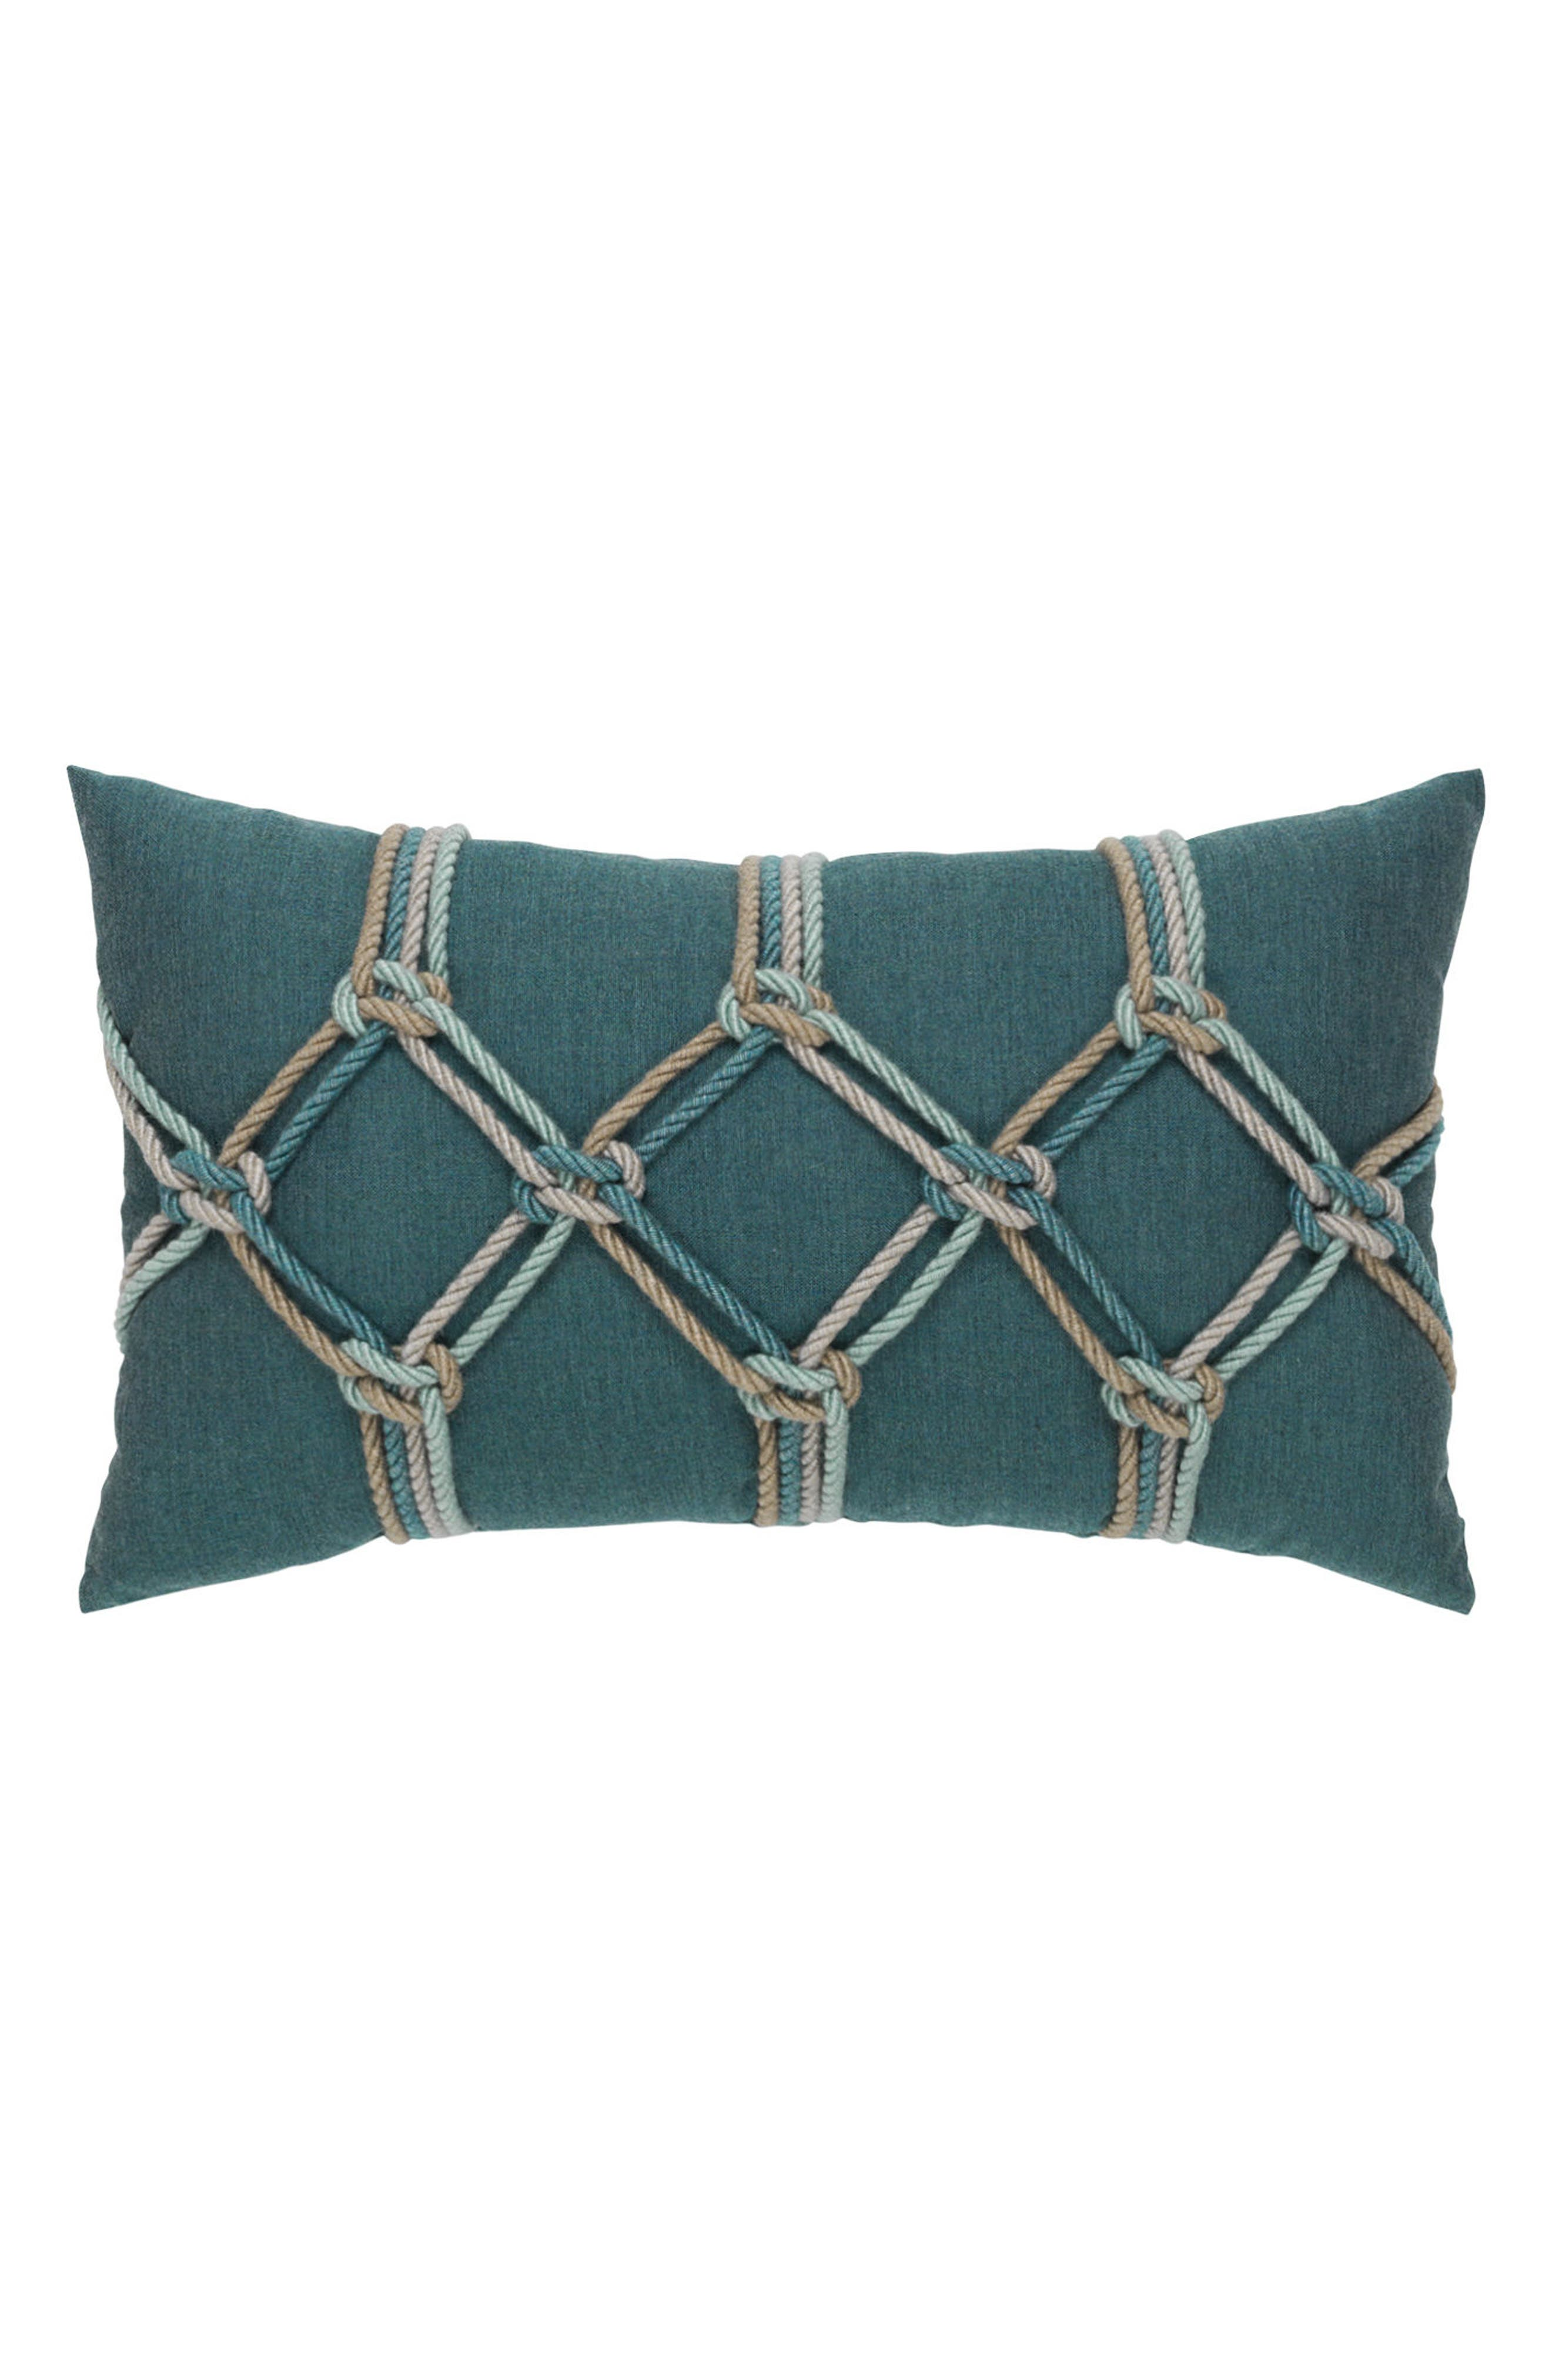 Lagoon Rope Lumbar Pillow,                         Main,                         color, BLUE